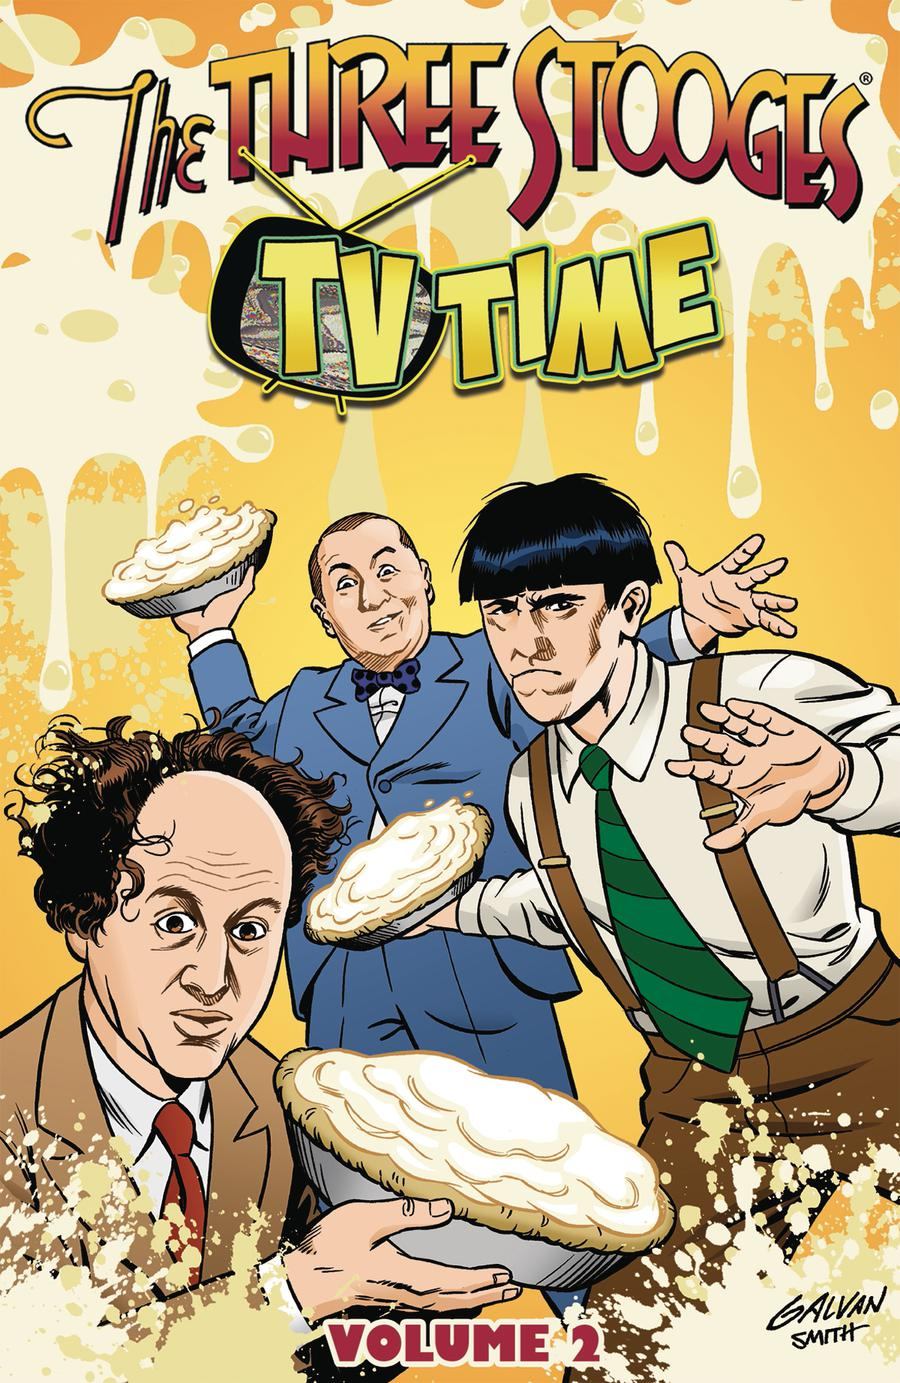 Three Stooges Vol 2 TV Time TP